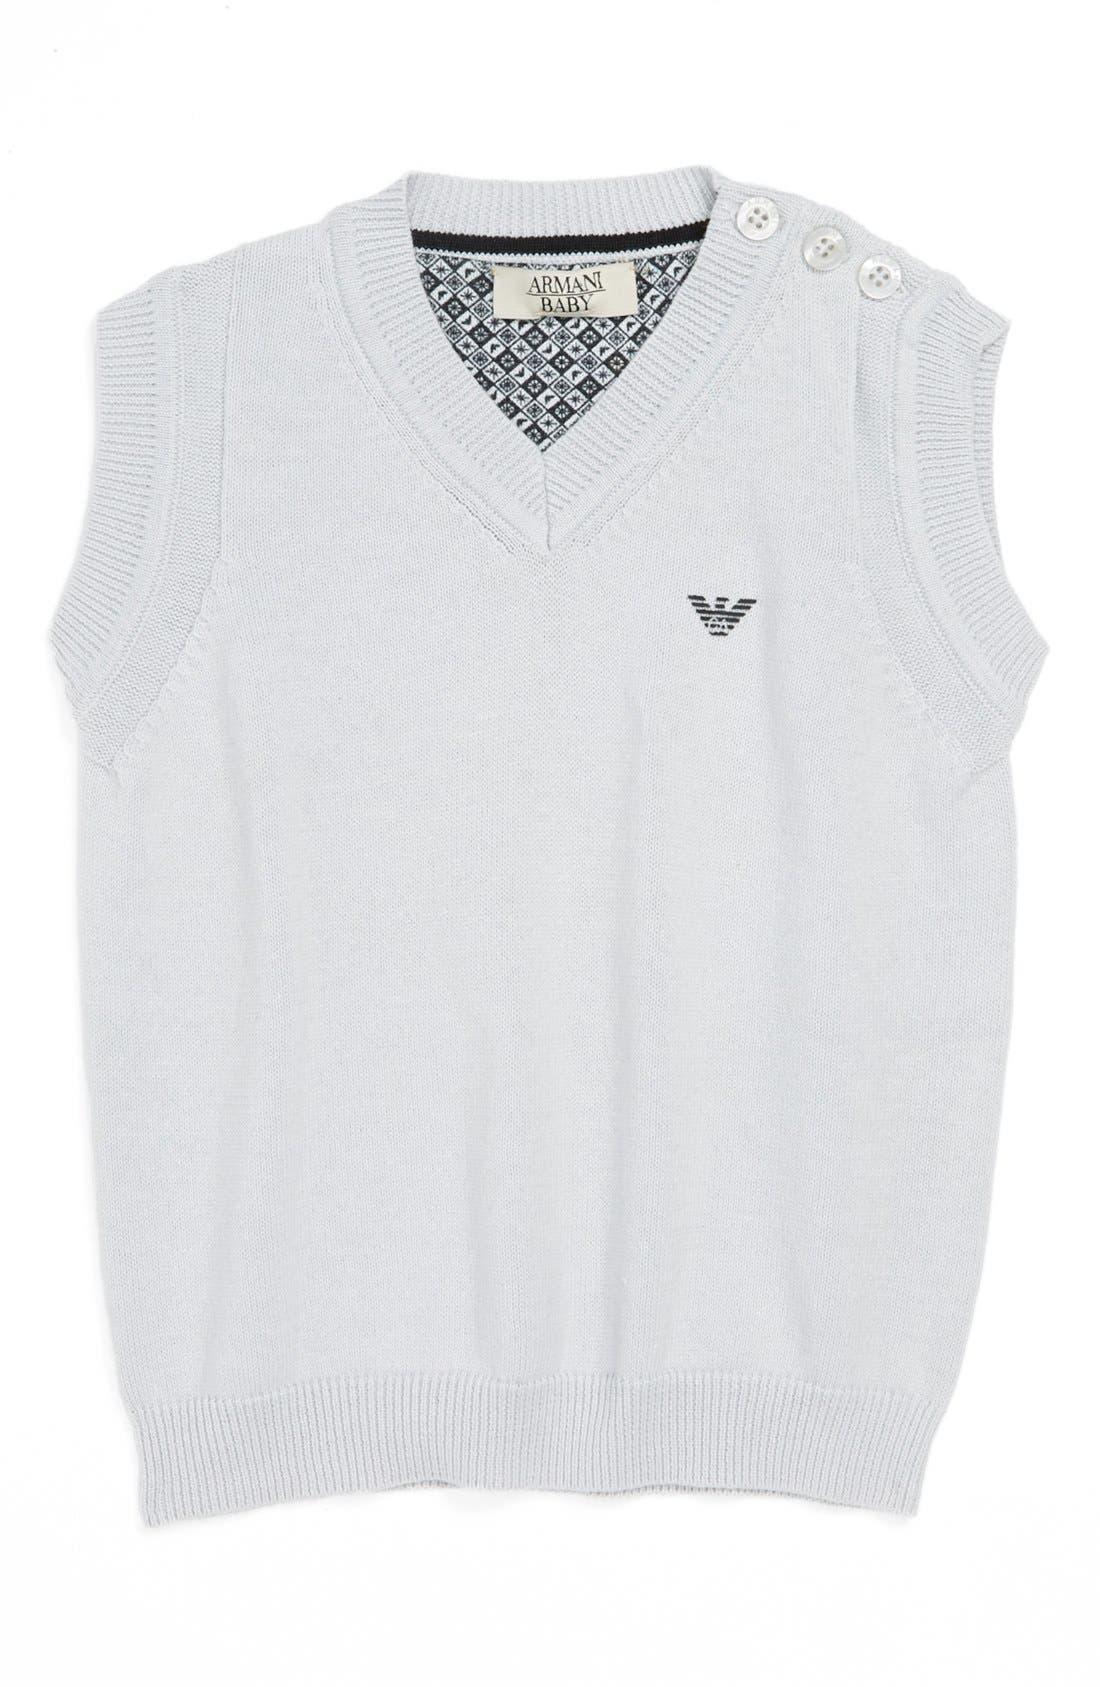 Alternate Image 1 Selected - Armani Junior Cotton Sweater Vest (Baby Boys)